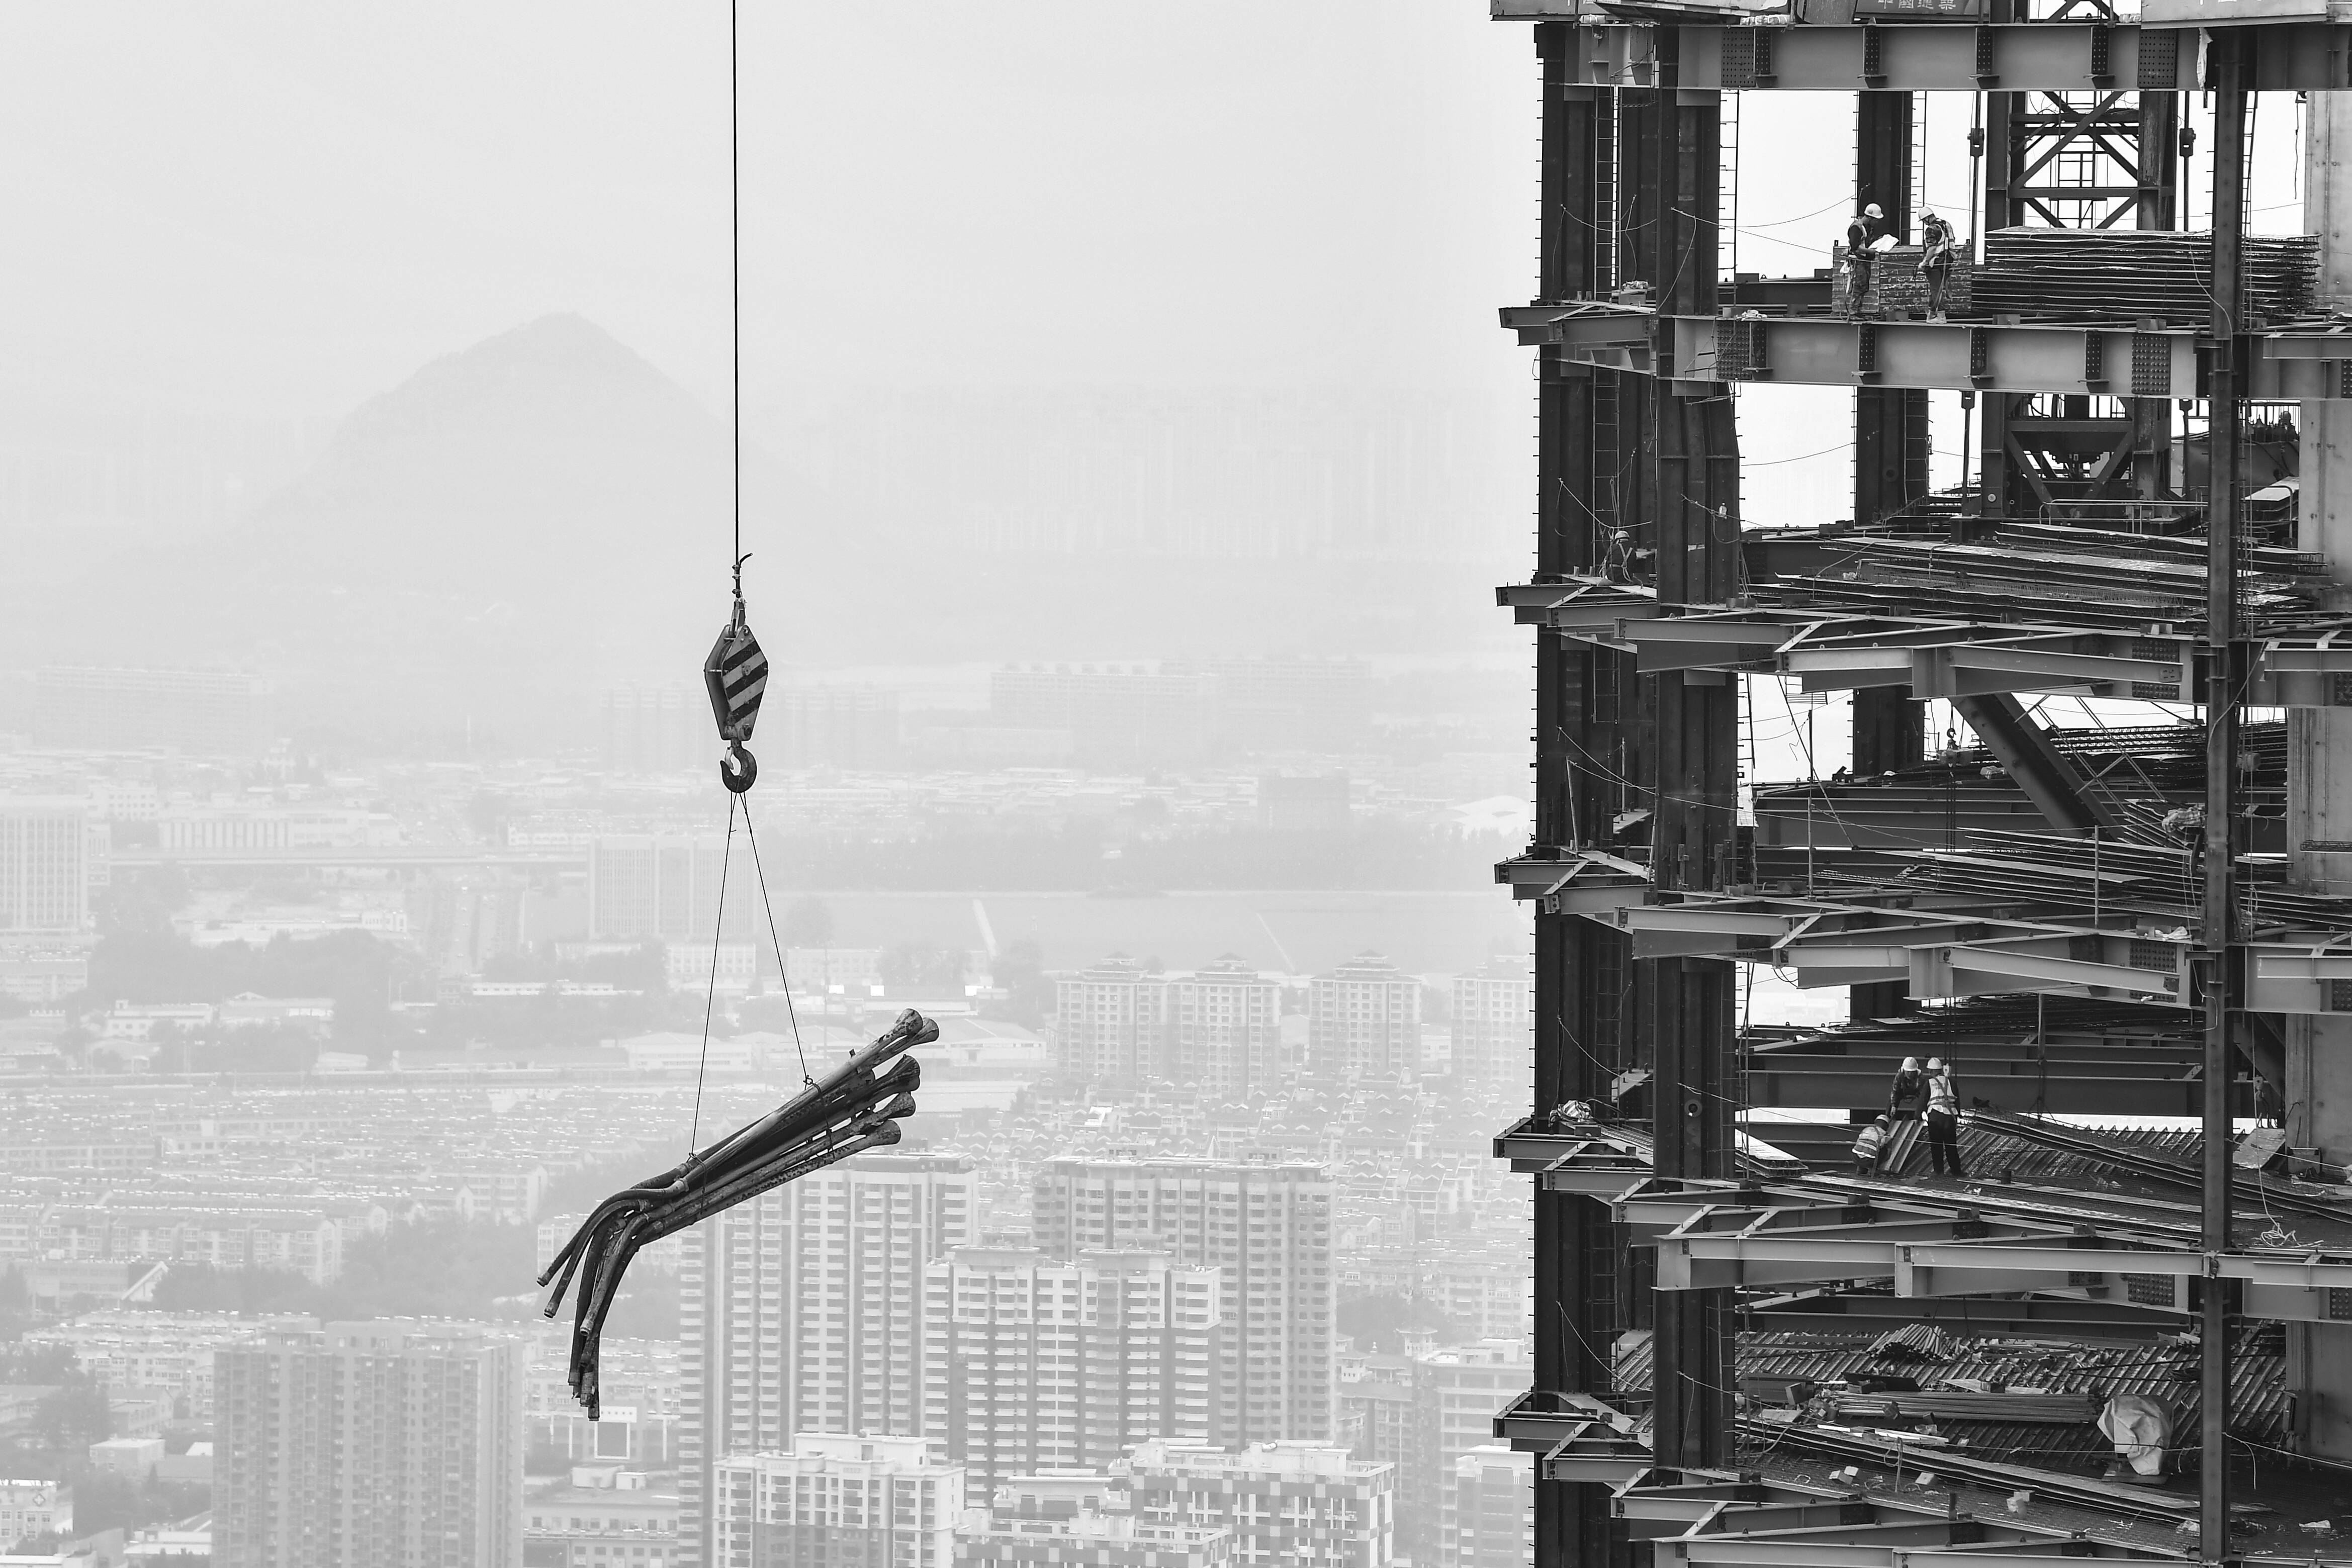 Vlog∣濟南(nan)360米超高層大廈封頂 帶你登(deng)高感受不一(yi)樣的視角